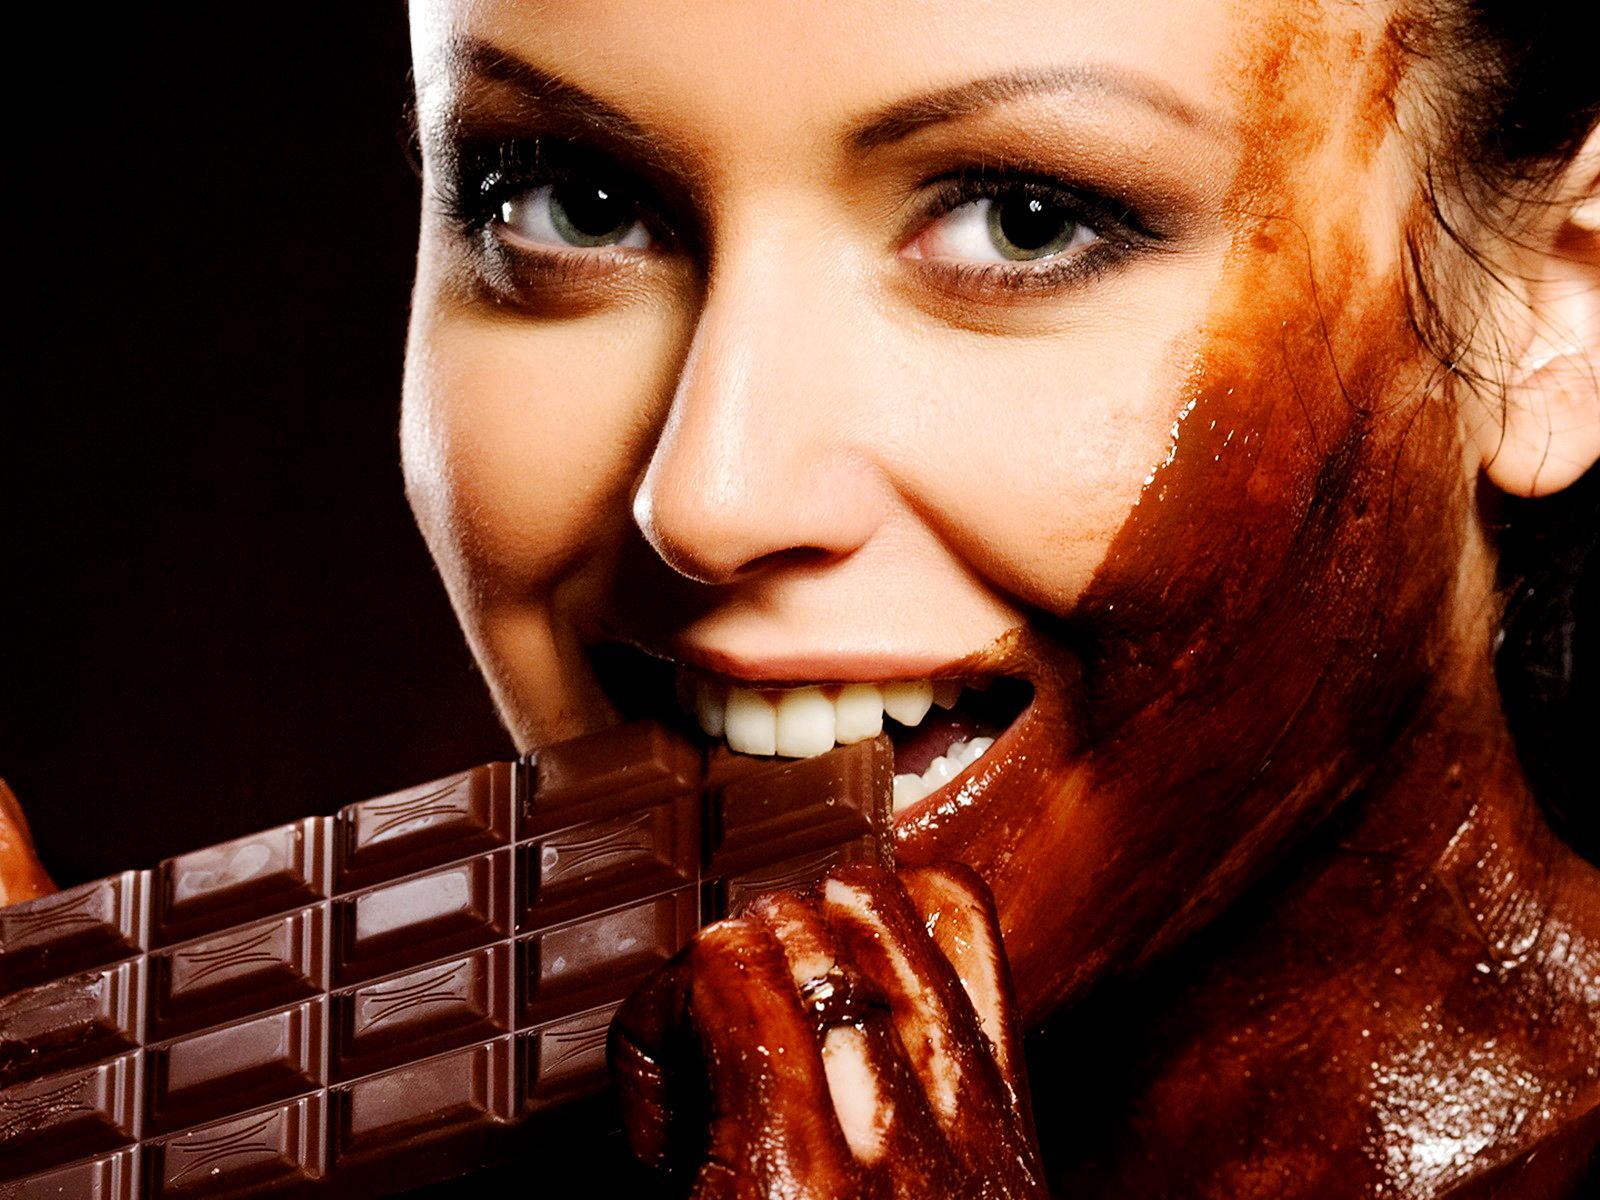 chocolates_have_antioxidants